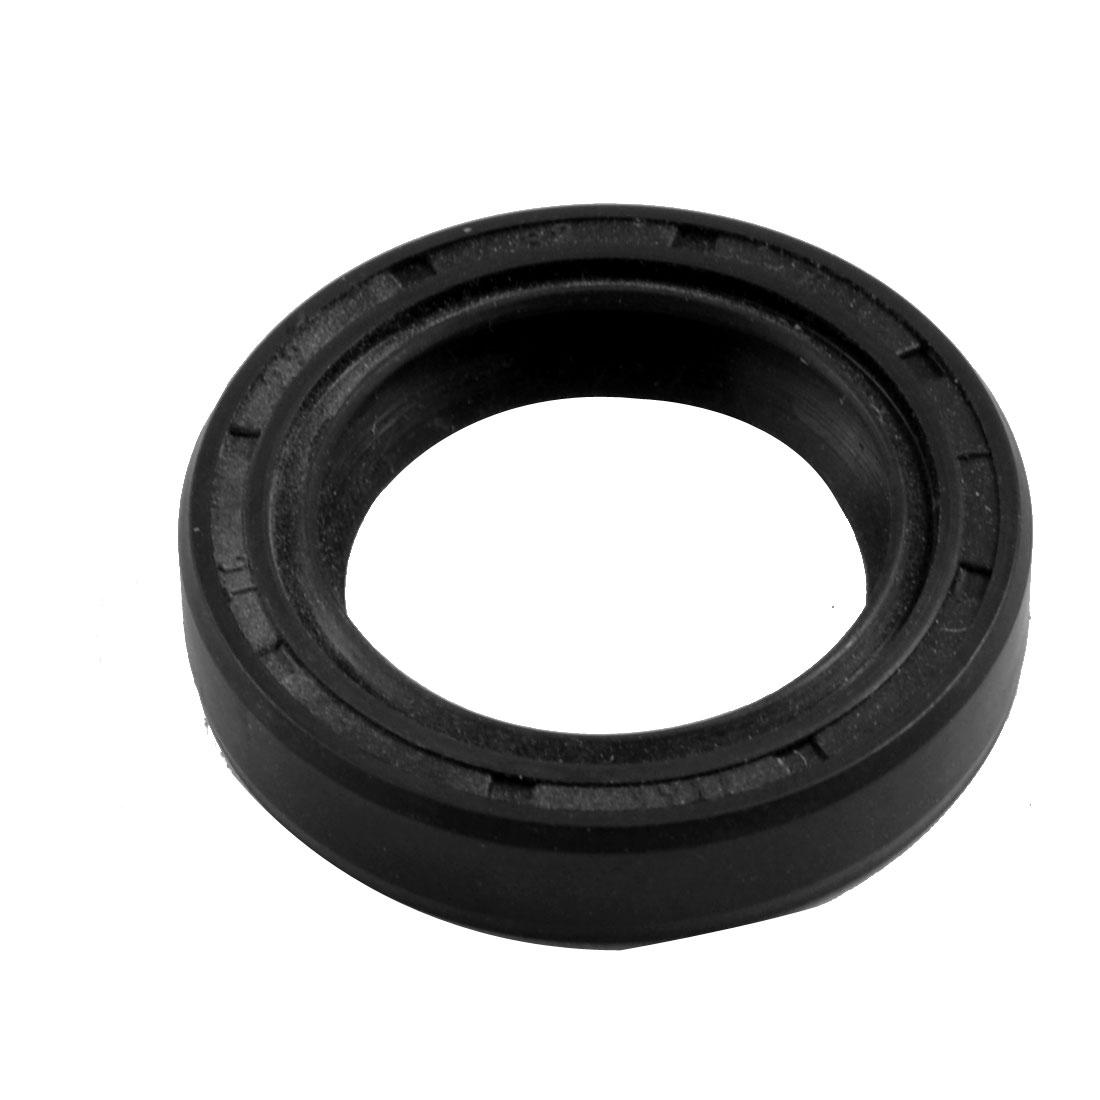 Black Nitrile Rubber Dual Lips Oil Shaft Seal TC 22mm x 32mm x 7mm